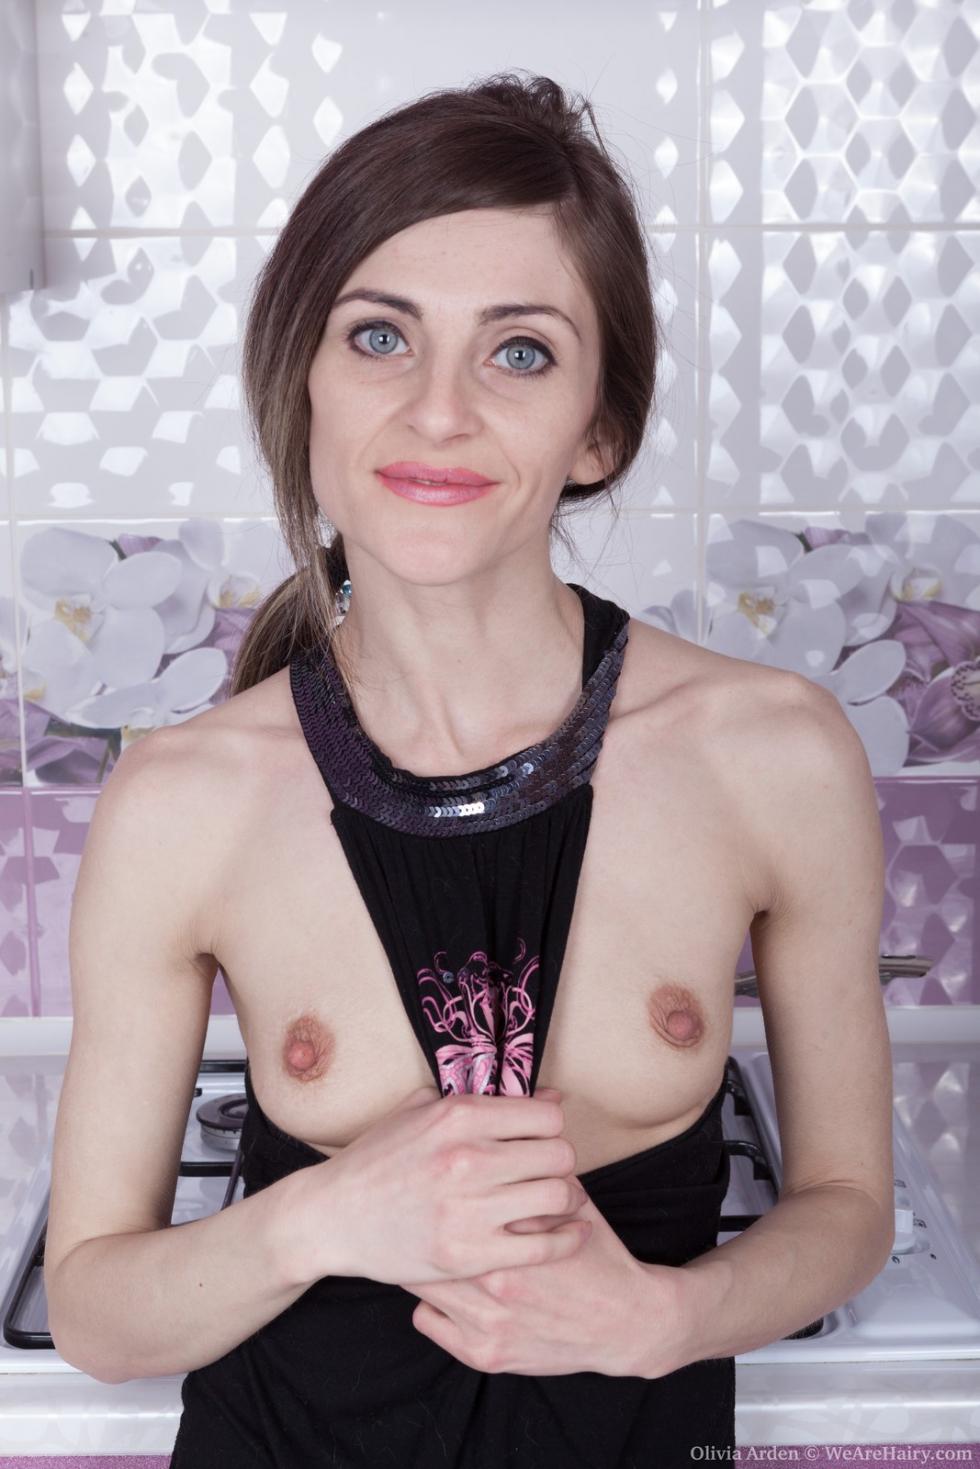 hard nips hot nude